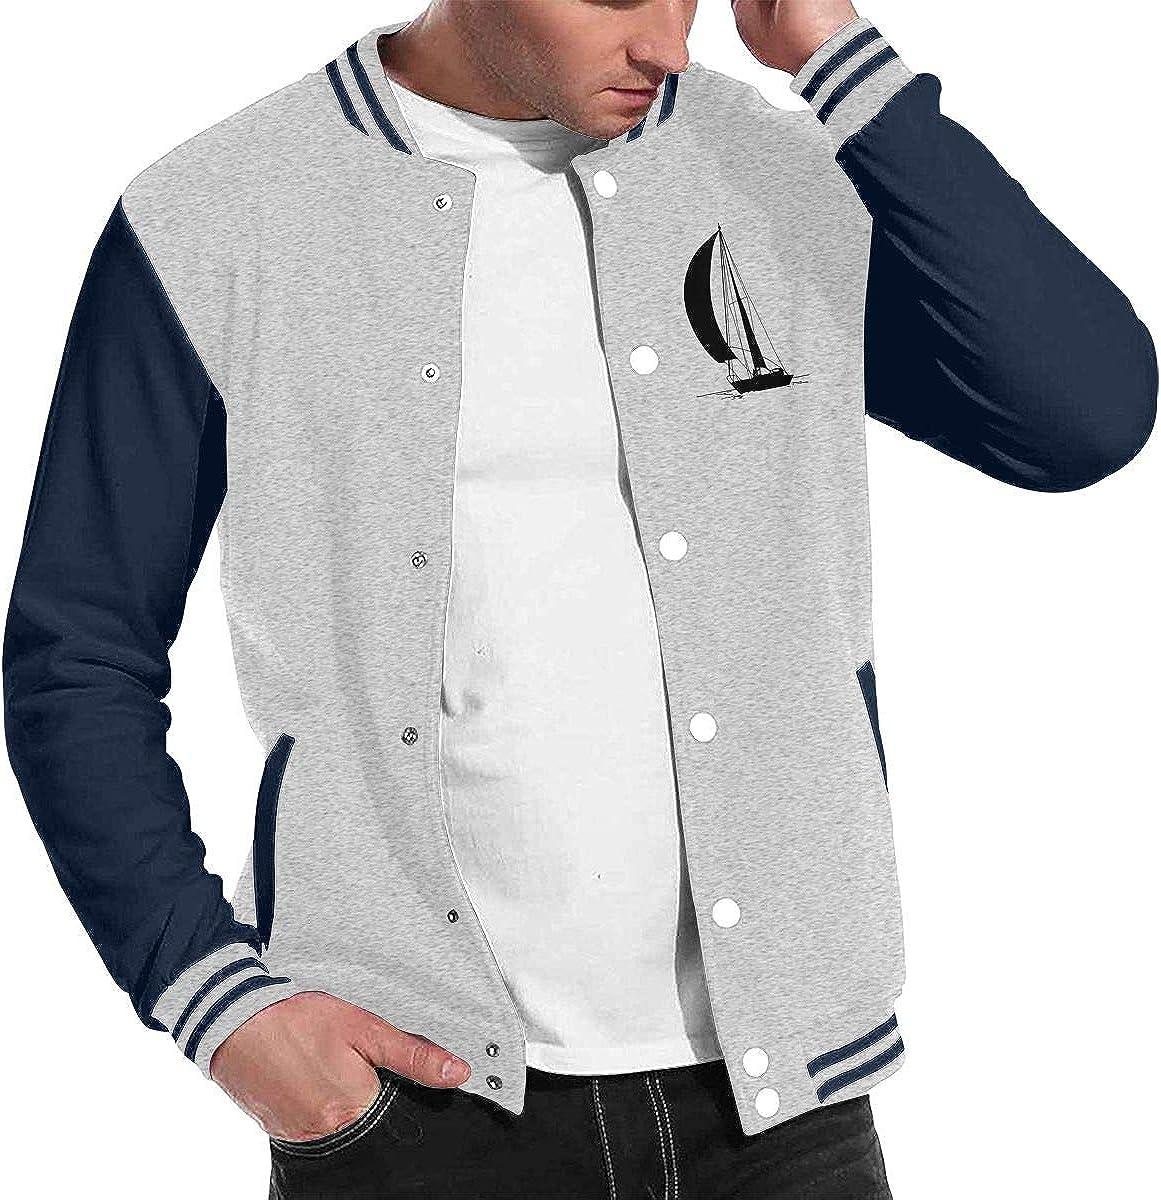 Silhouette of Sailboat Mens Cool Baseball Uniform Jacket Sport Coat